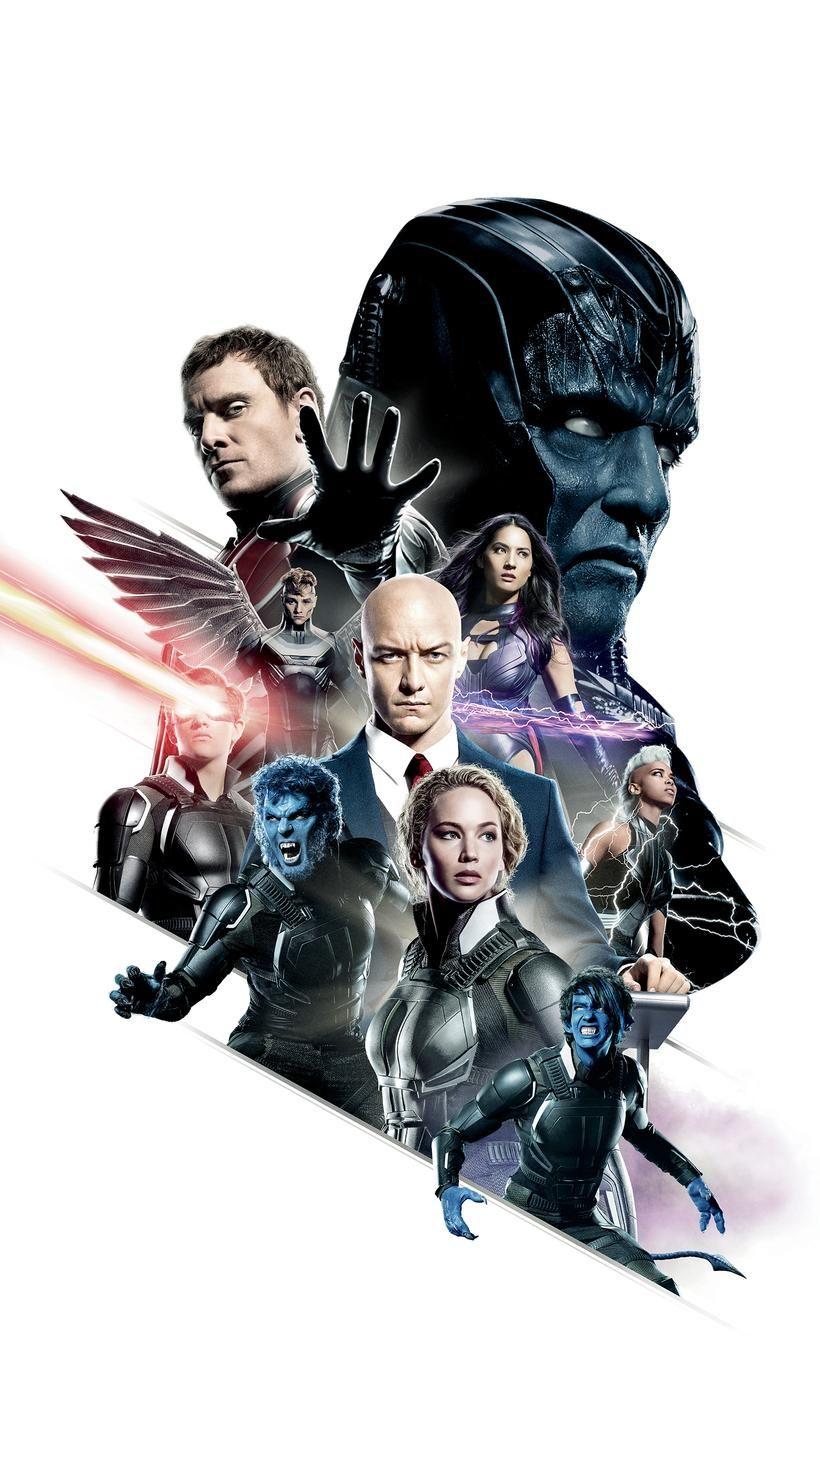 Moviemania Textless High Resolution Movie Wallpapers X Men Marvel Artwork Movie Wallpapers